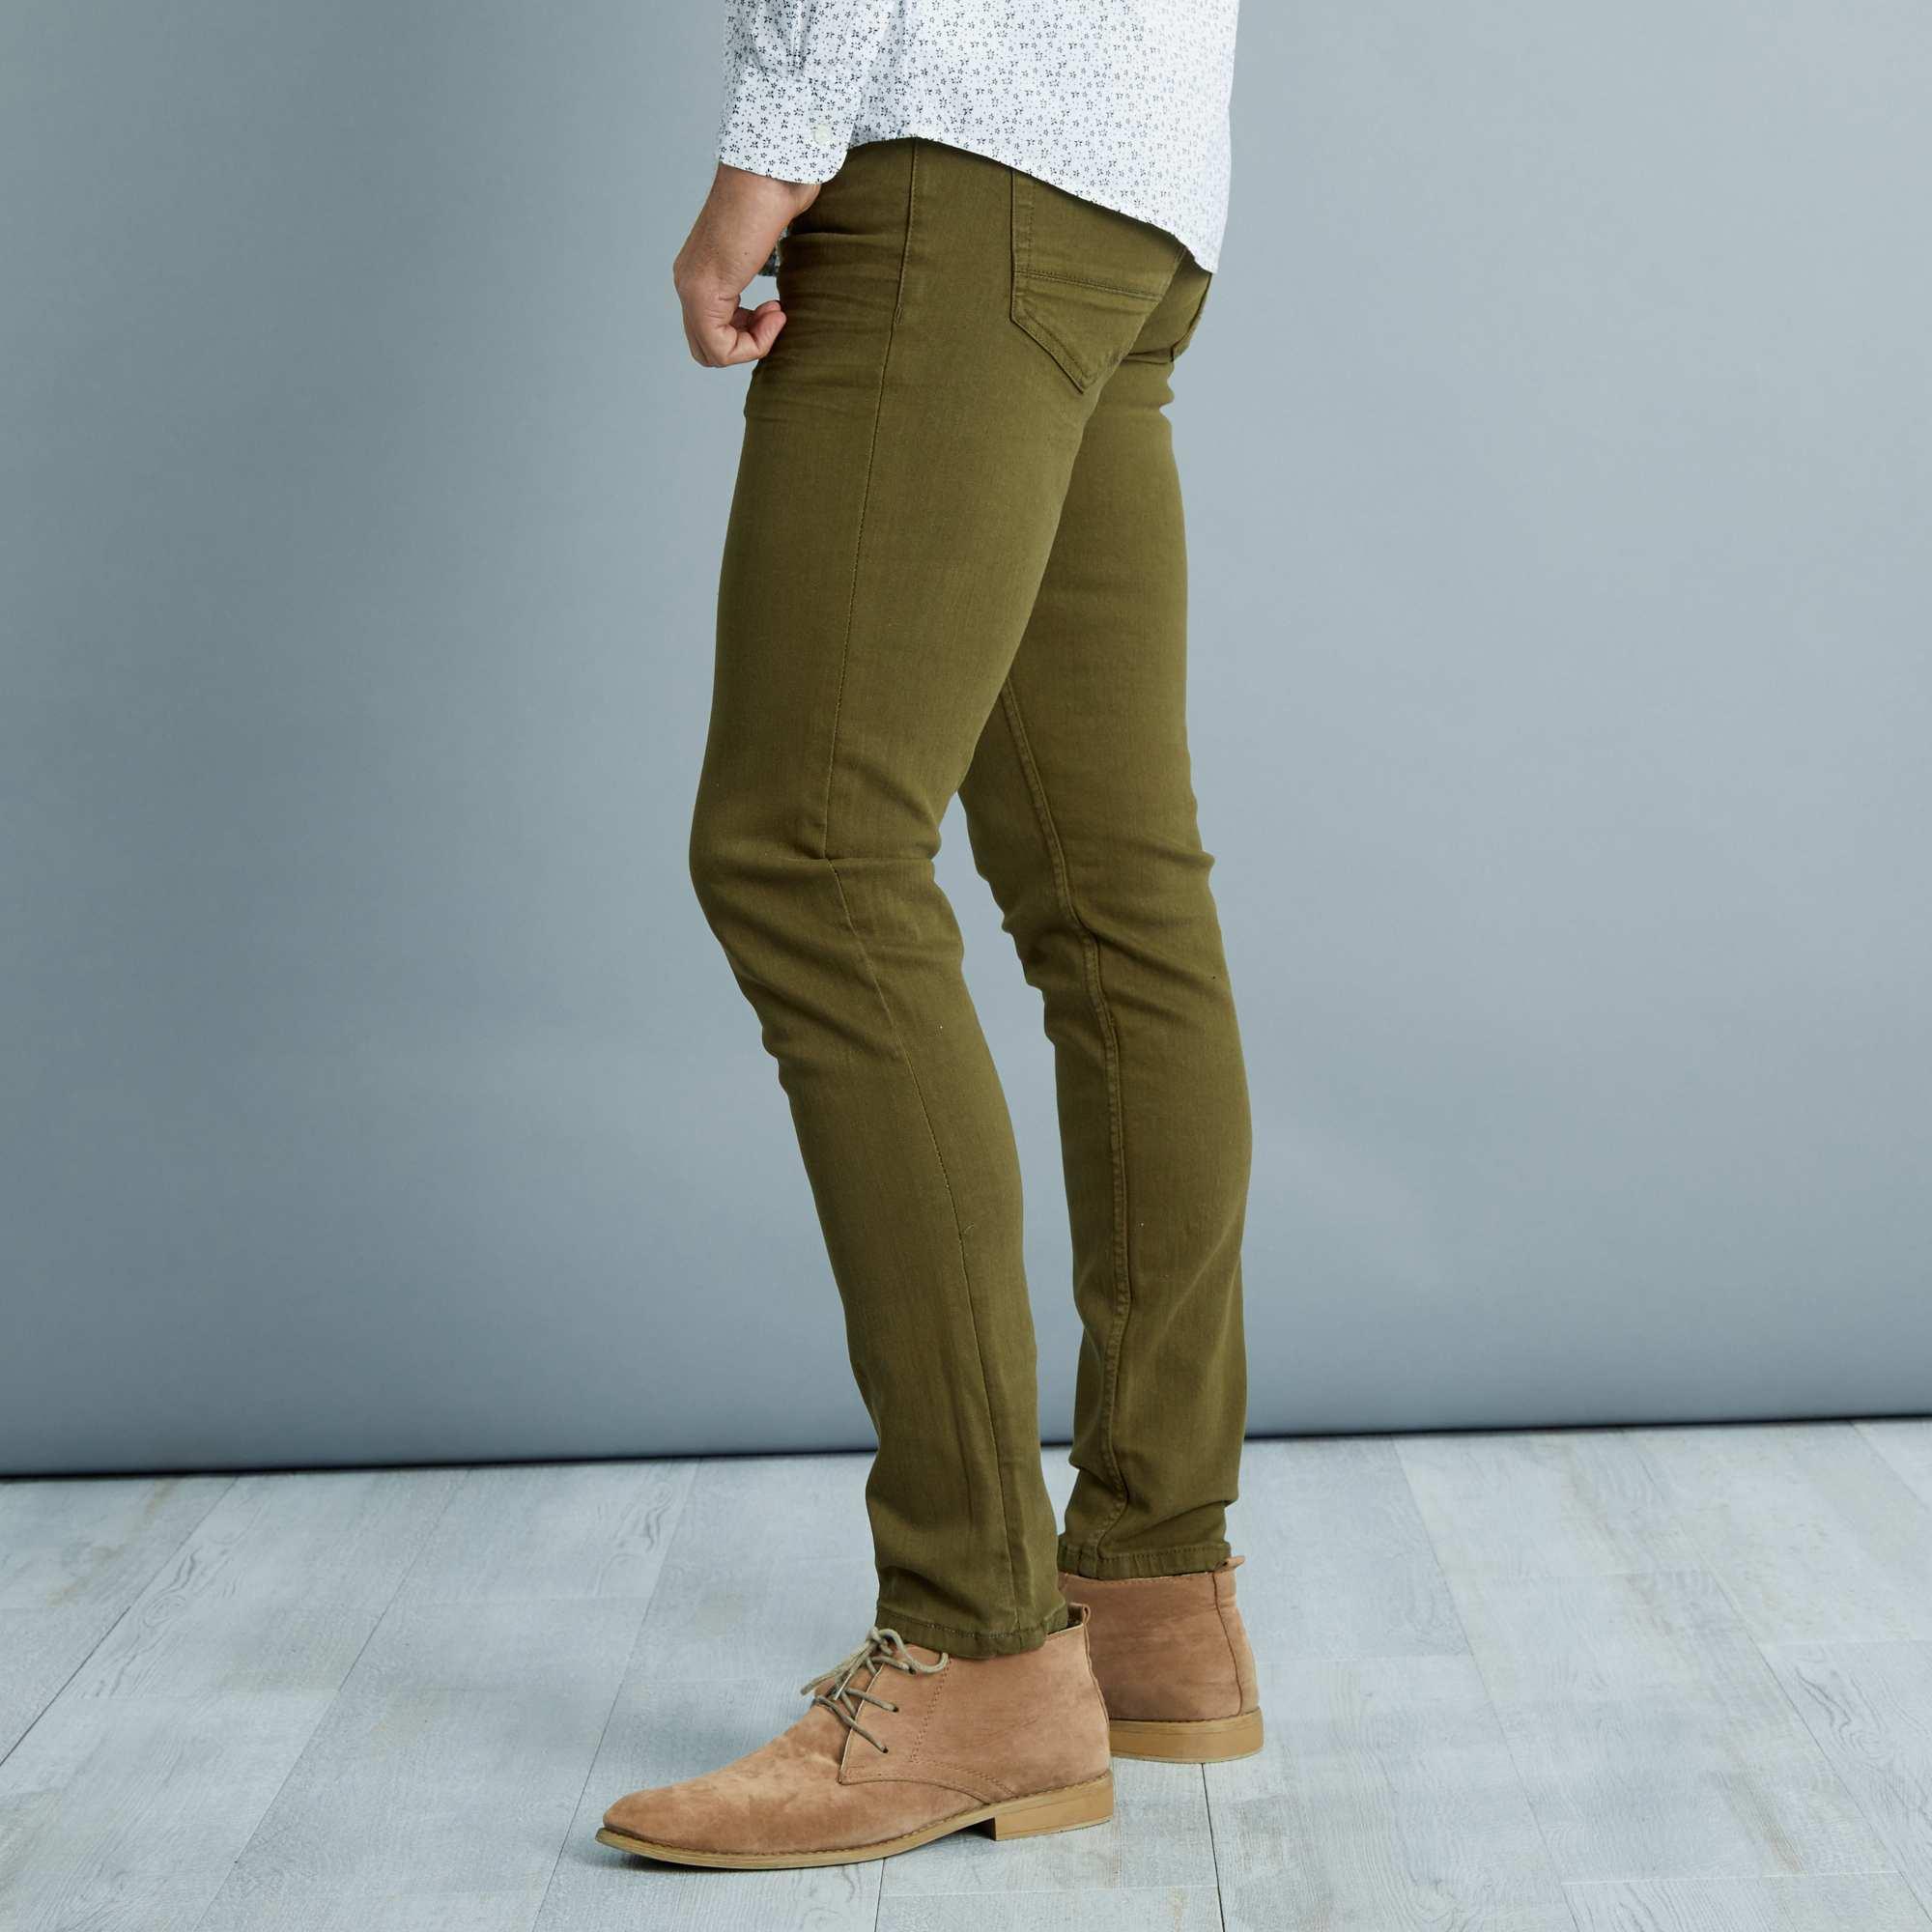 pantalon slim 5 poches coton stretch homme kaki kiabi 25 00. Black Bedroom Furniture Sets. Home Design Ideas